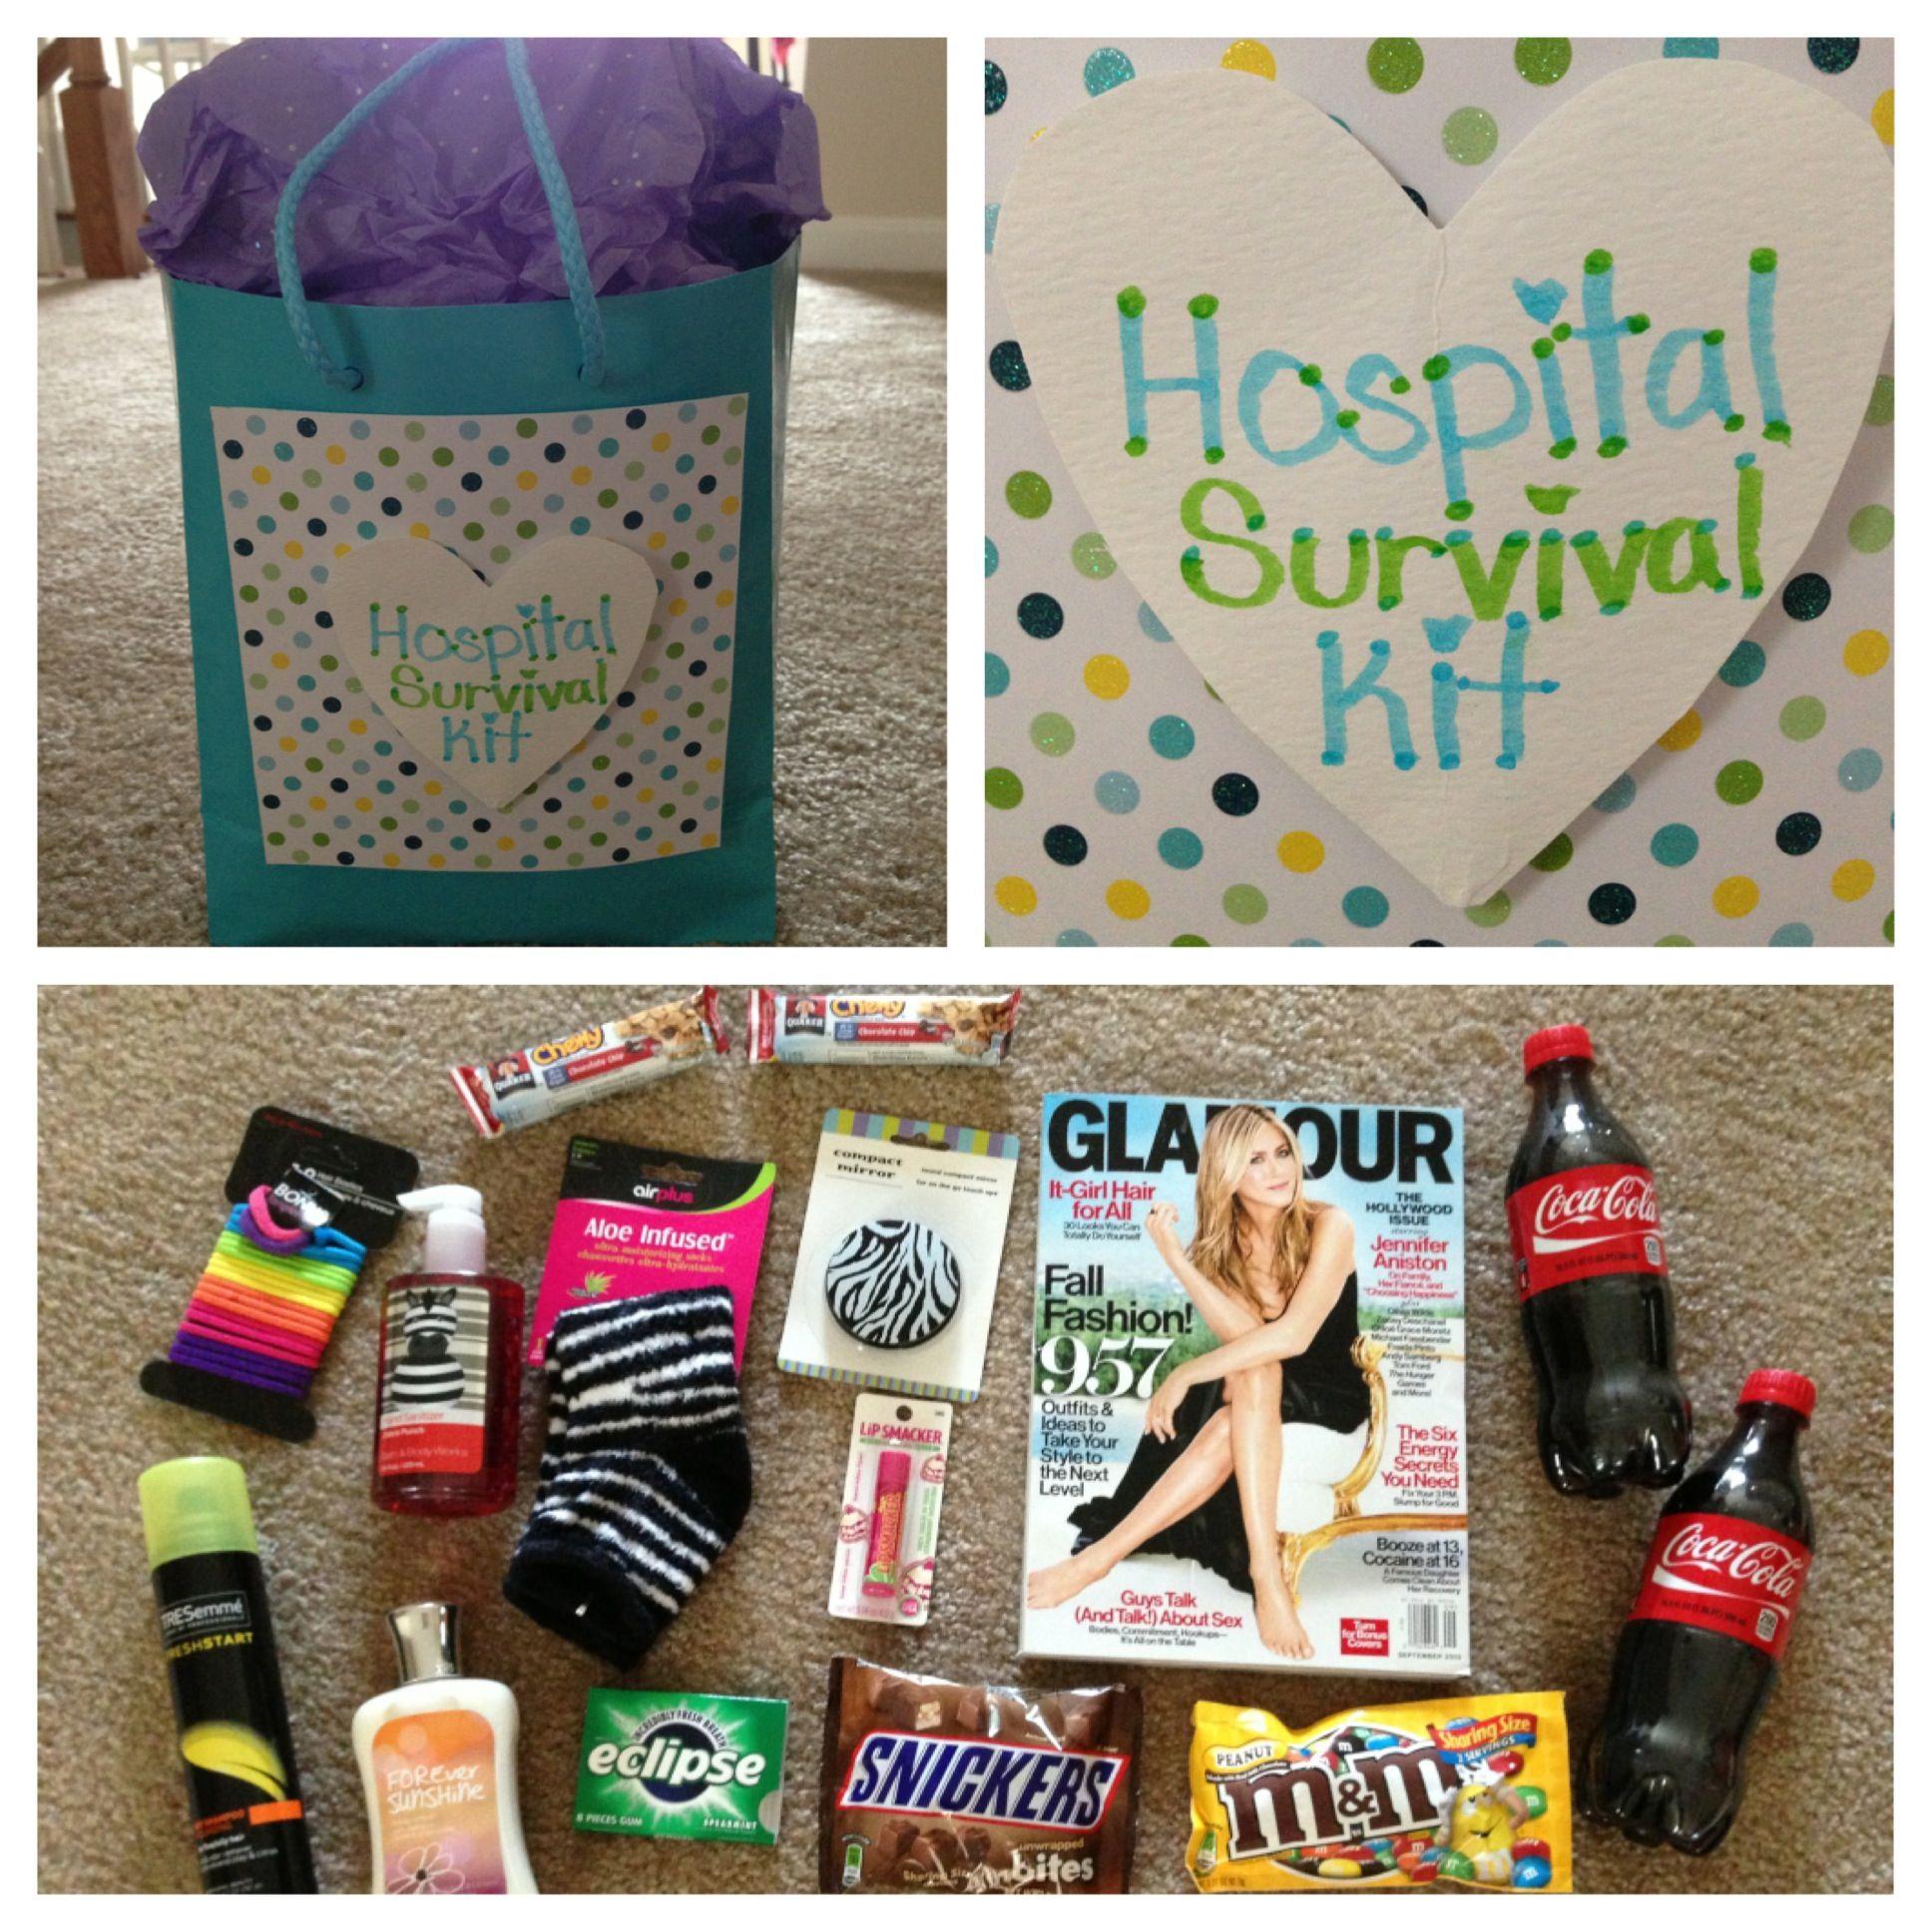 Hospital Survival Kit Including A Magazine Fuzzy Socks Hair